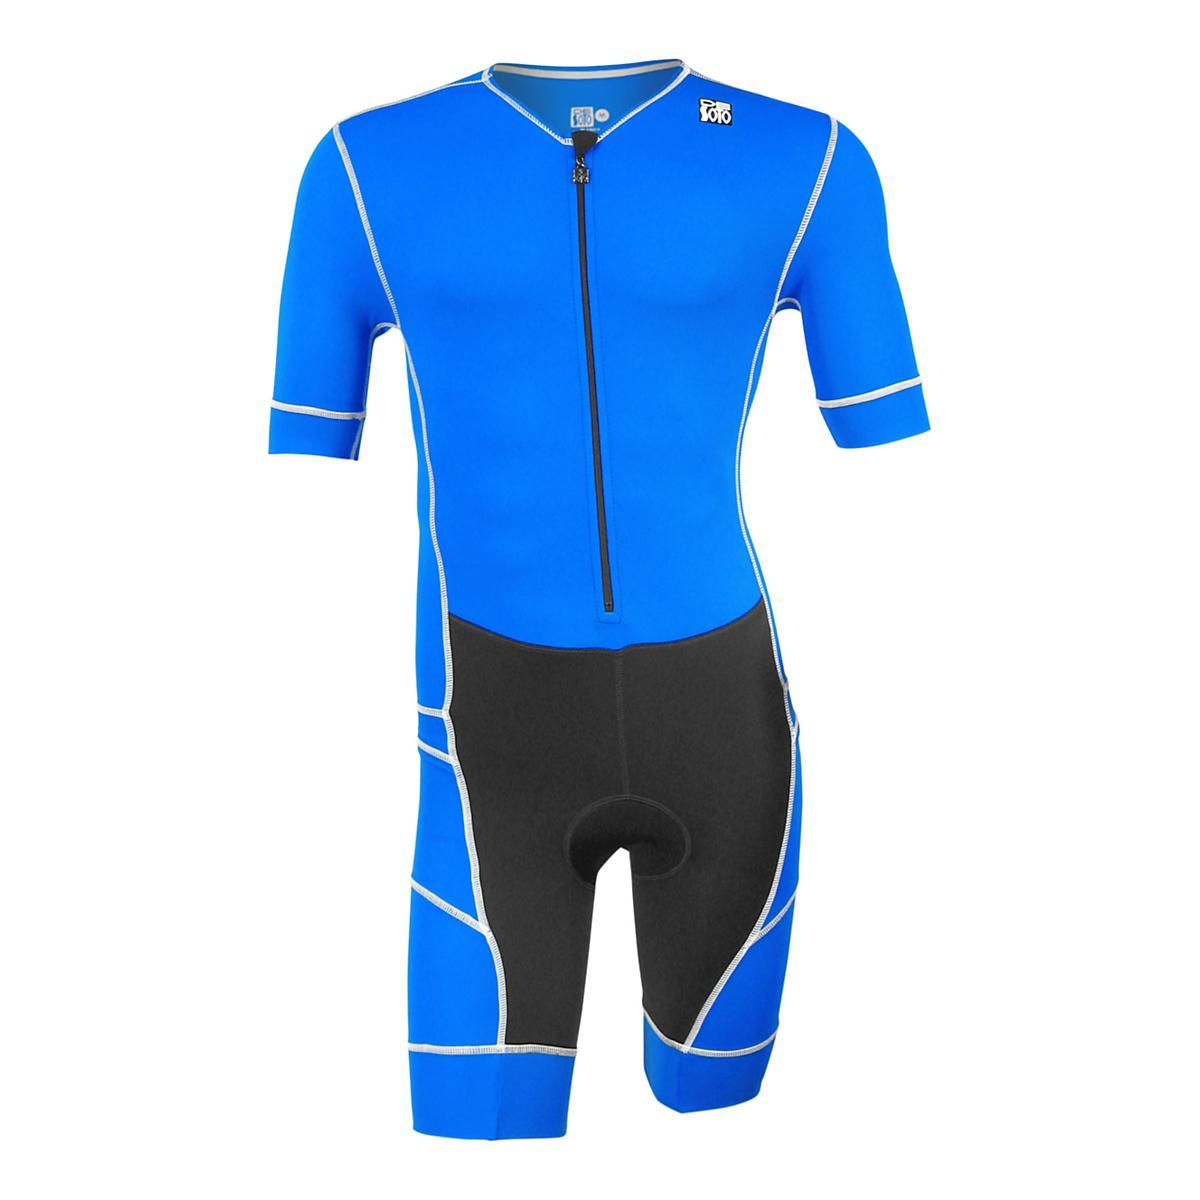 Subrayar Restaurar Radar  Mens De Soto Mobius Short Sleeve Trisuit Triathlon UniSuits at Road Runner  Sports